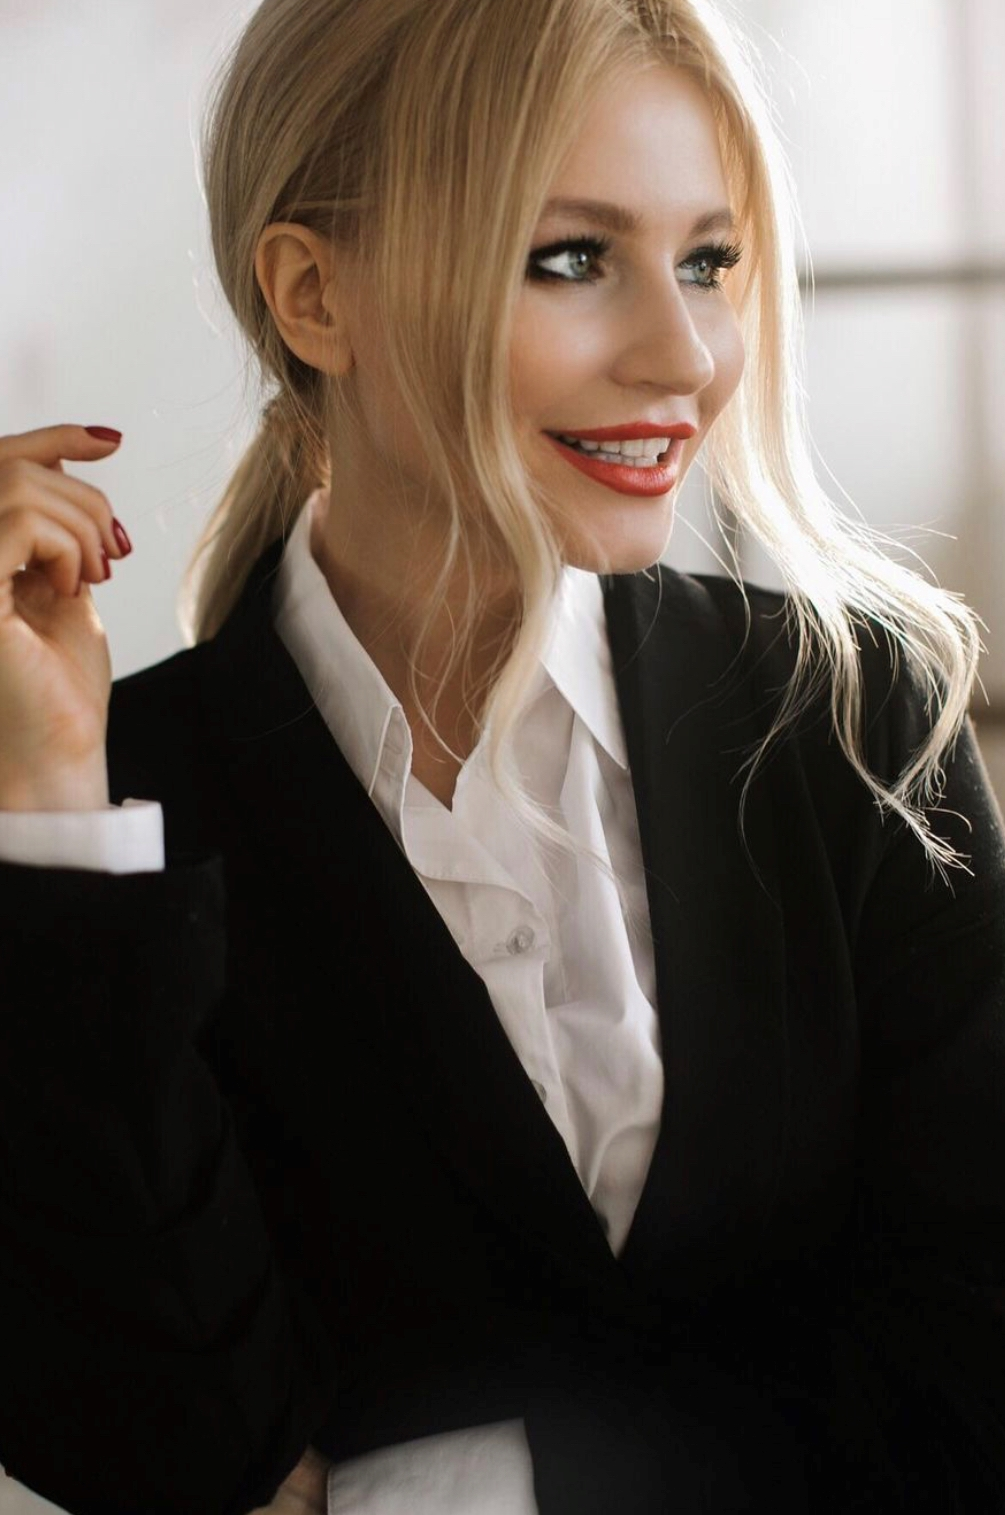 Agence matrimoniale rencontre de Anastassia  femme célibataire de 35 ans, Aquitaine.